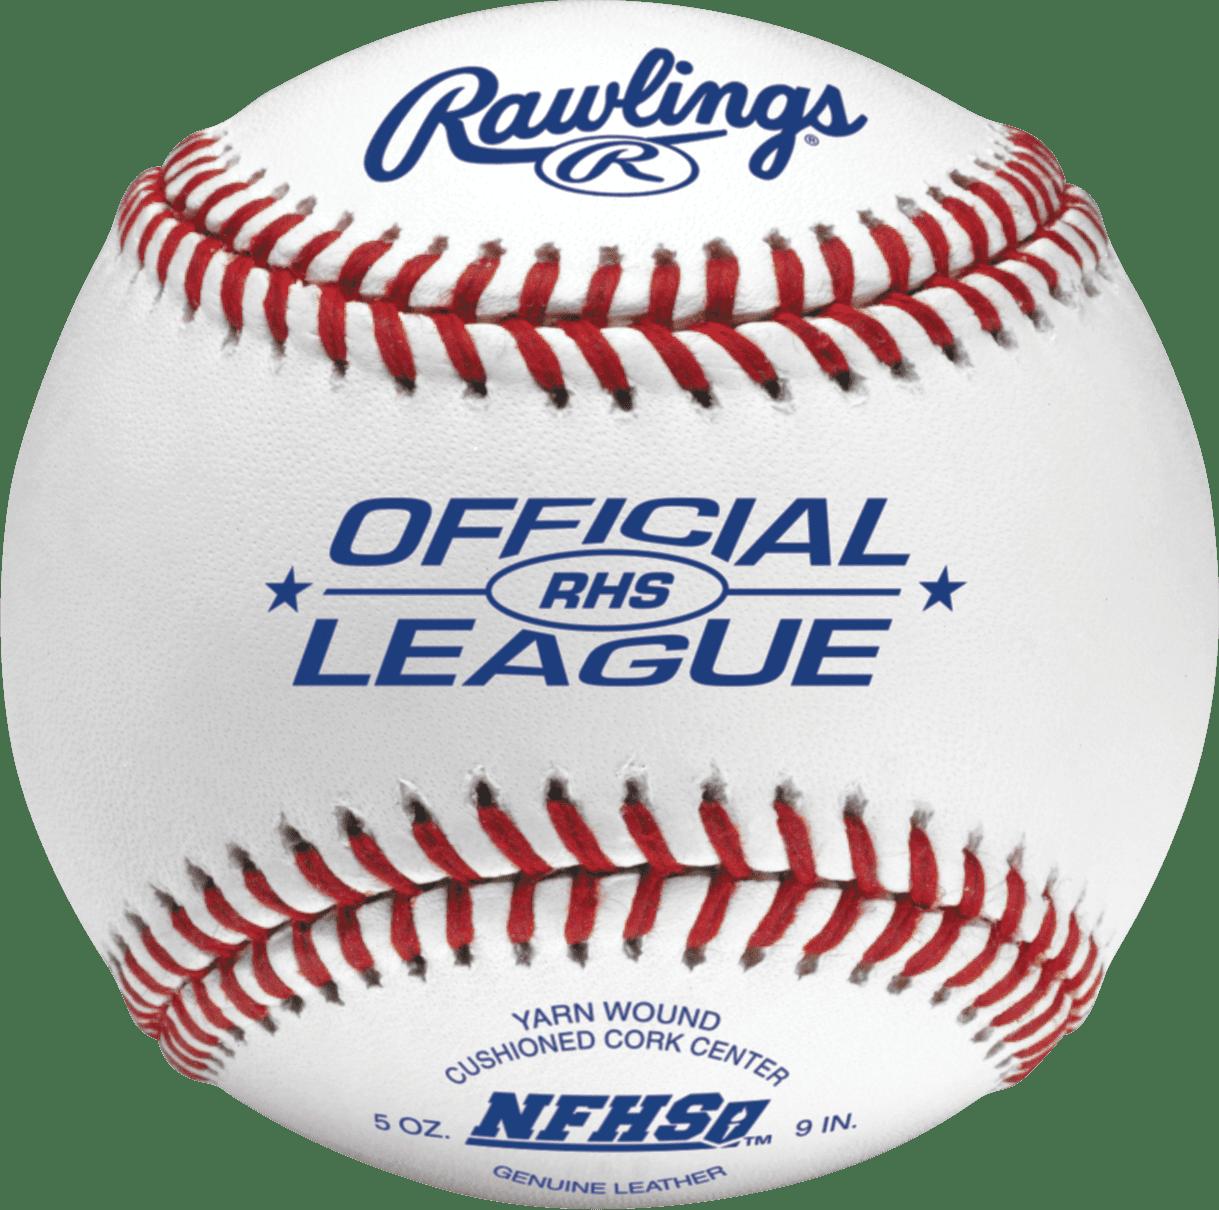 Rawlings NFHS High School Baseballs, Box of 24 by Rawlings